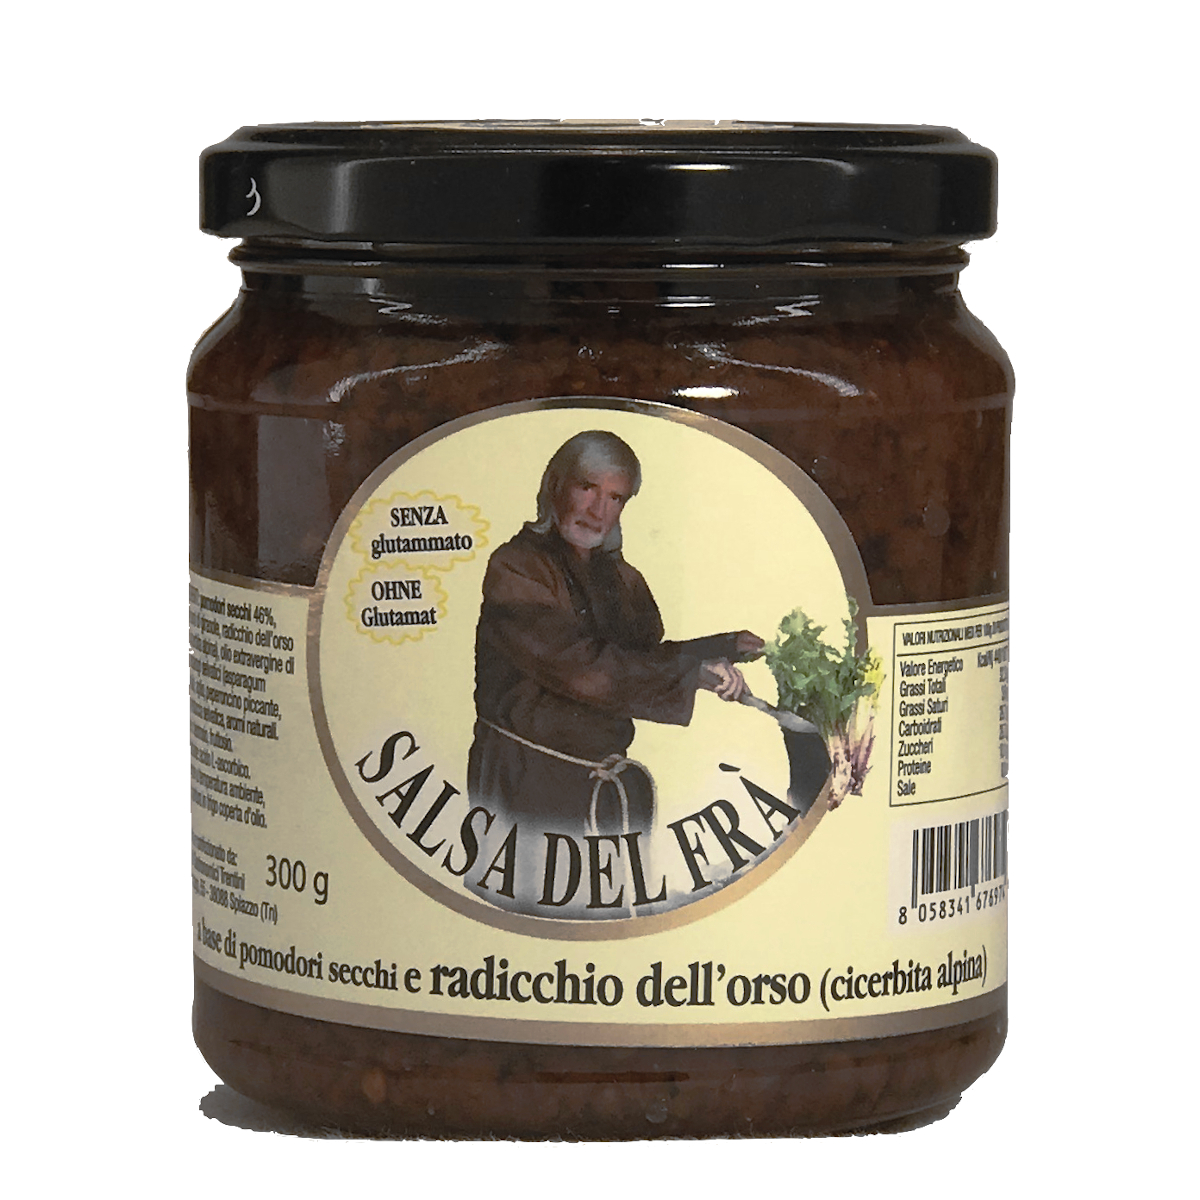 Salsa del Frà - milde Wildgemüsesauce  300 g - Mario Masè Frà